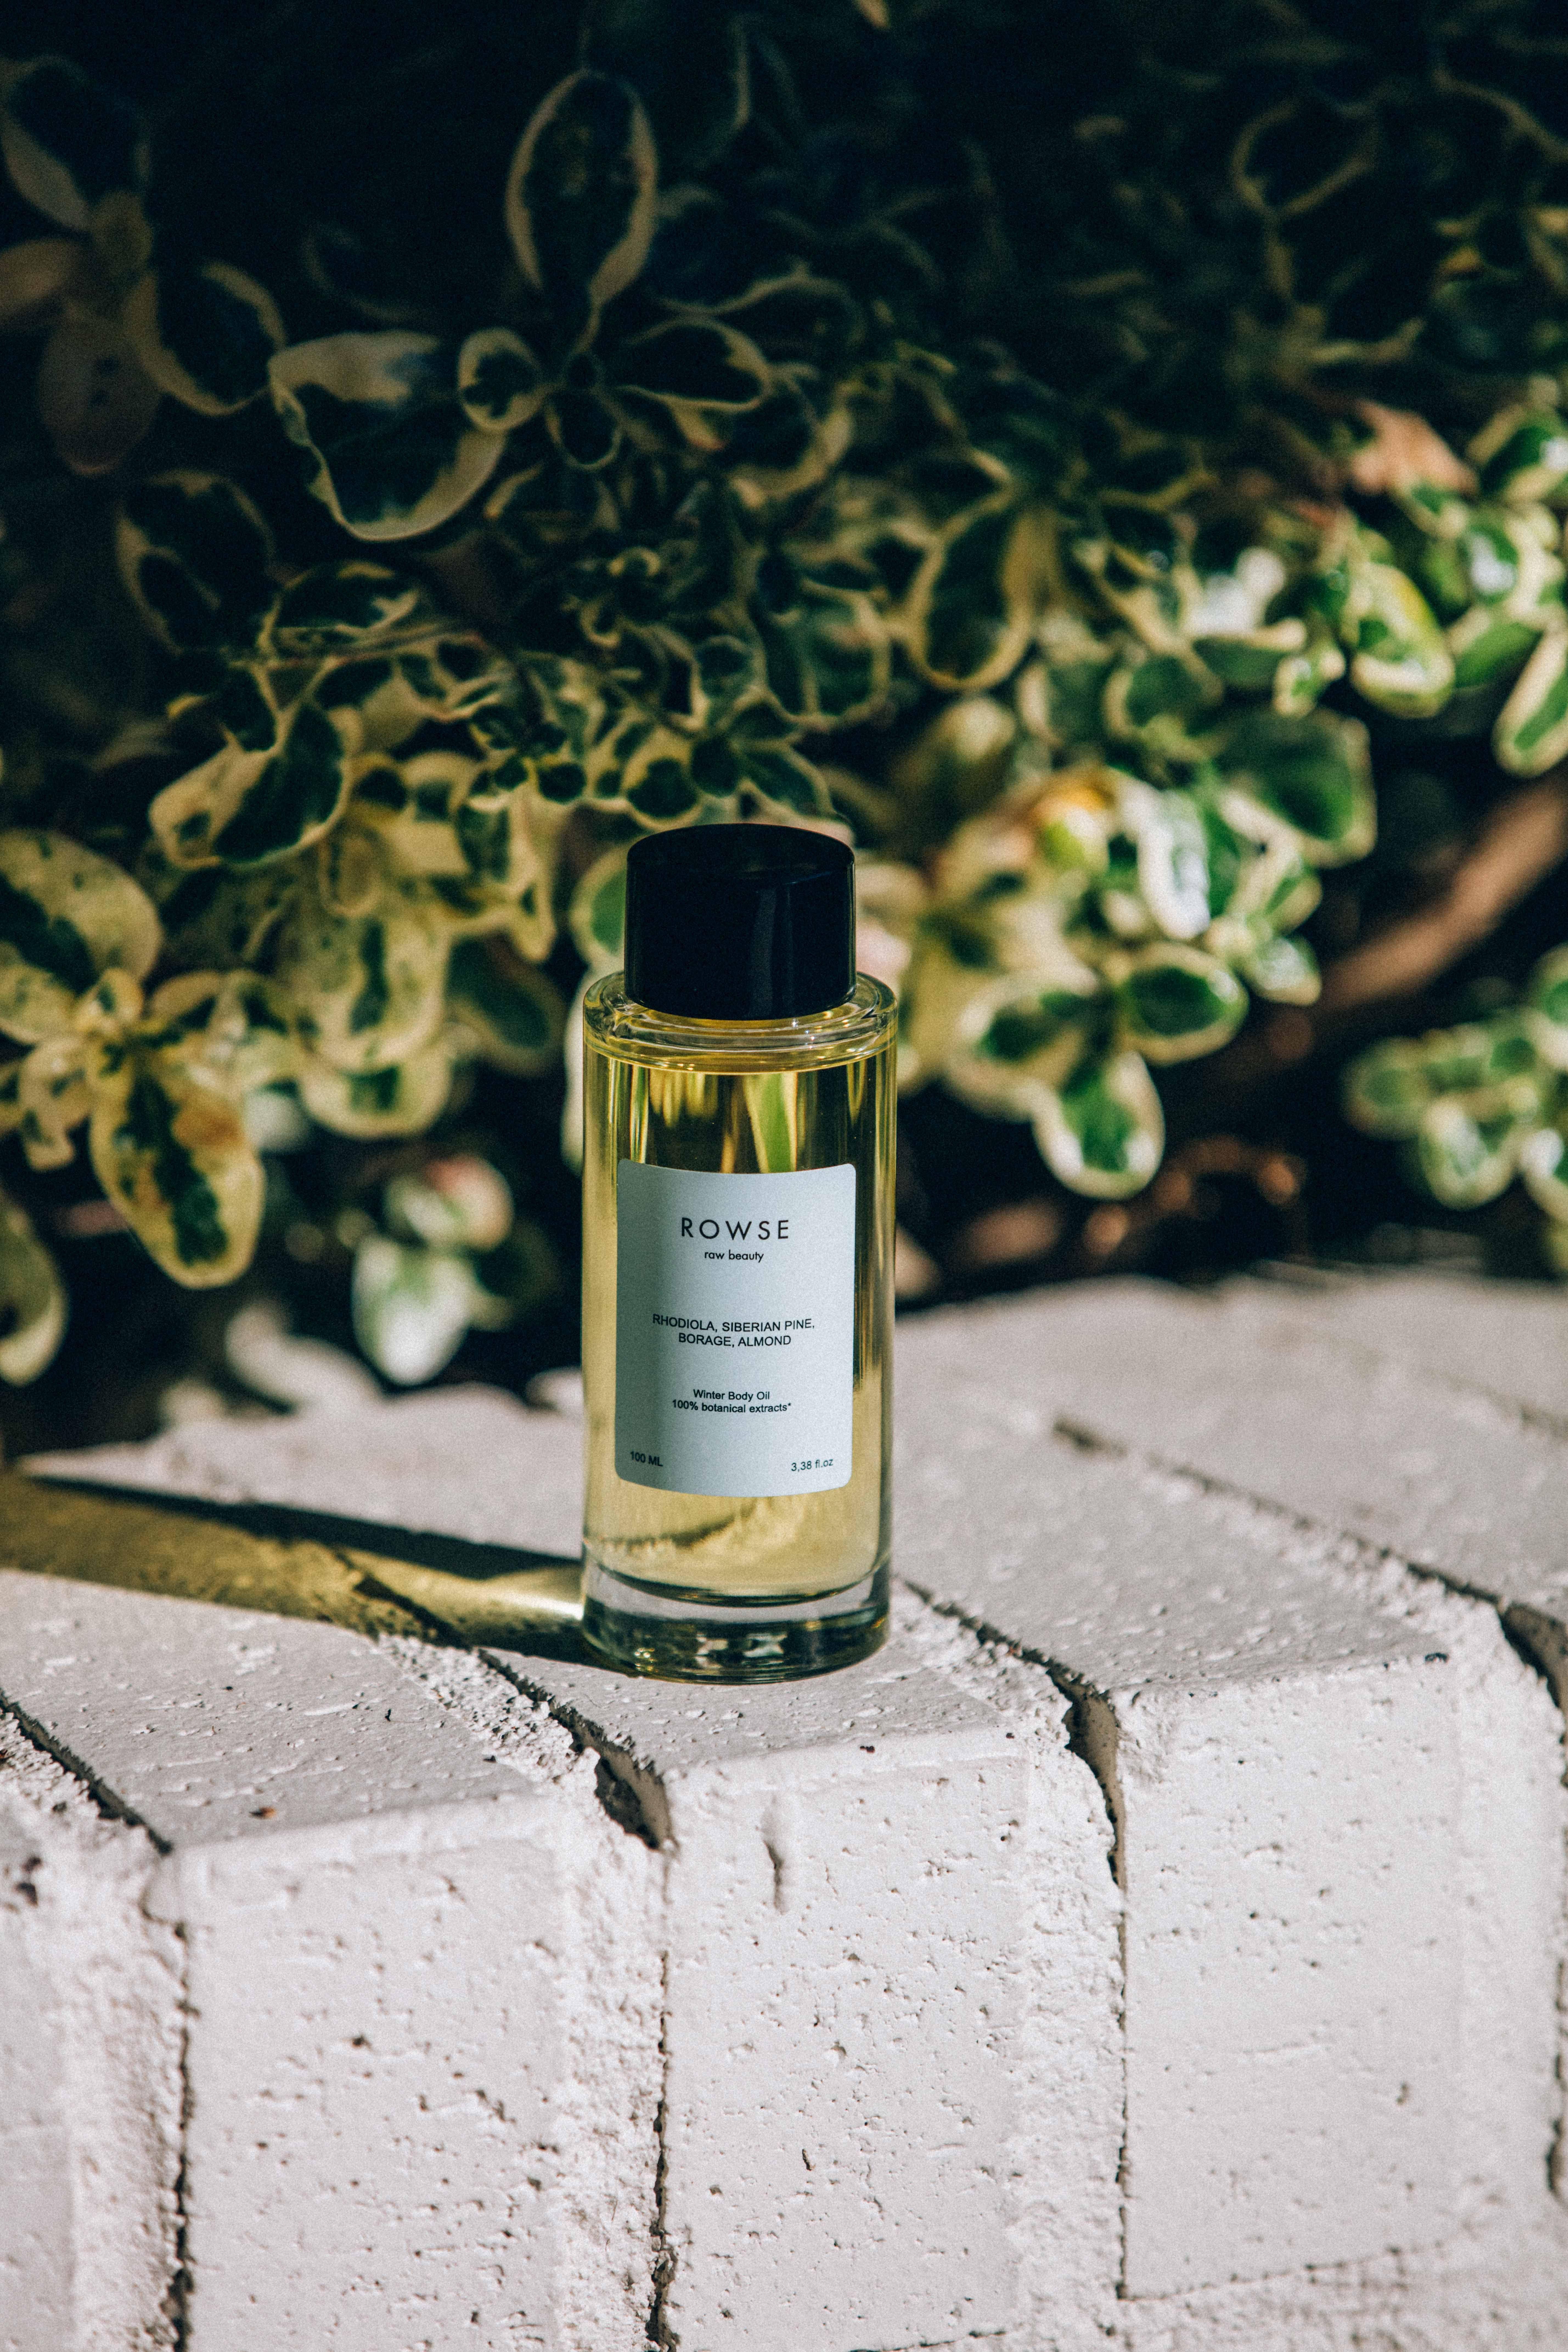 US ROWSE Solid shampoo, Plant based skincare, Cosmetics